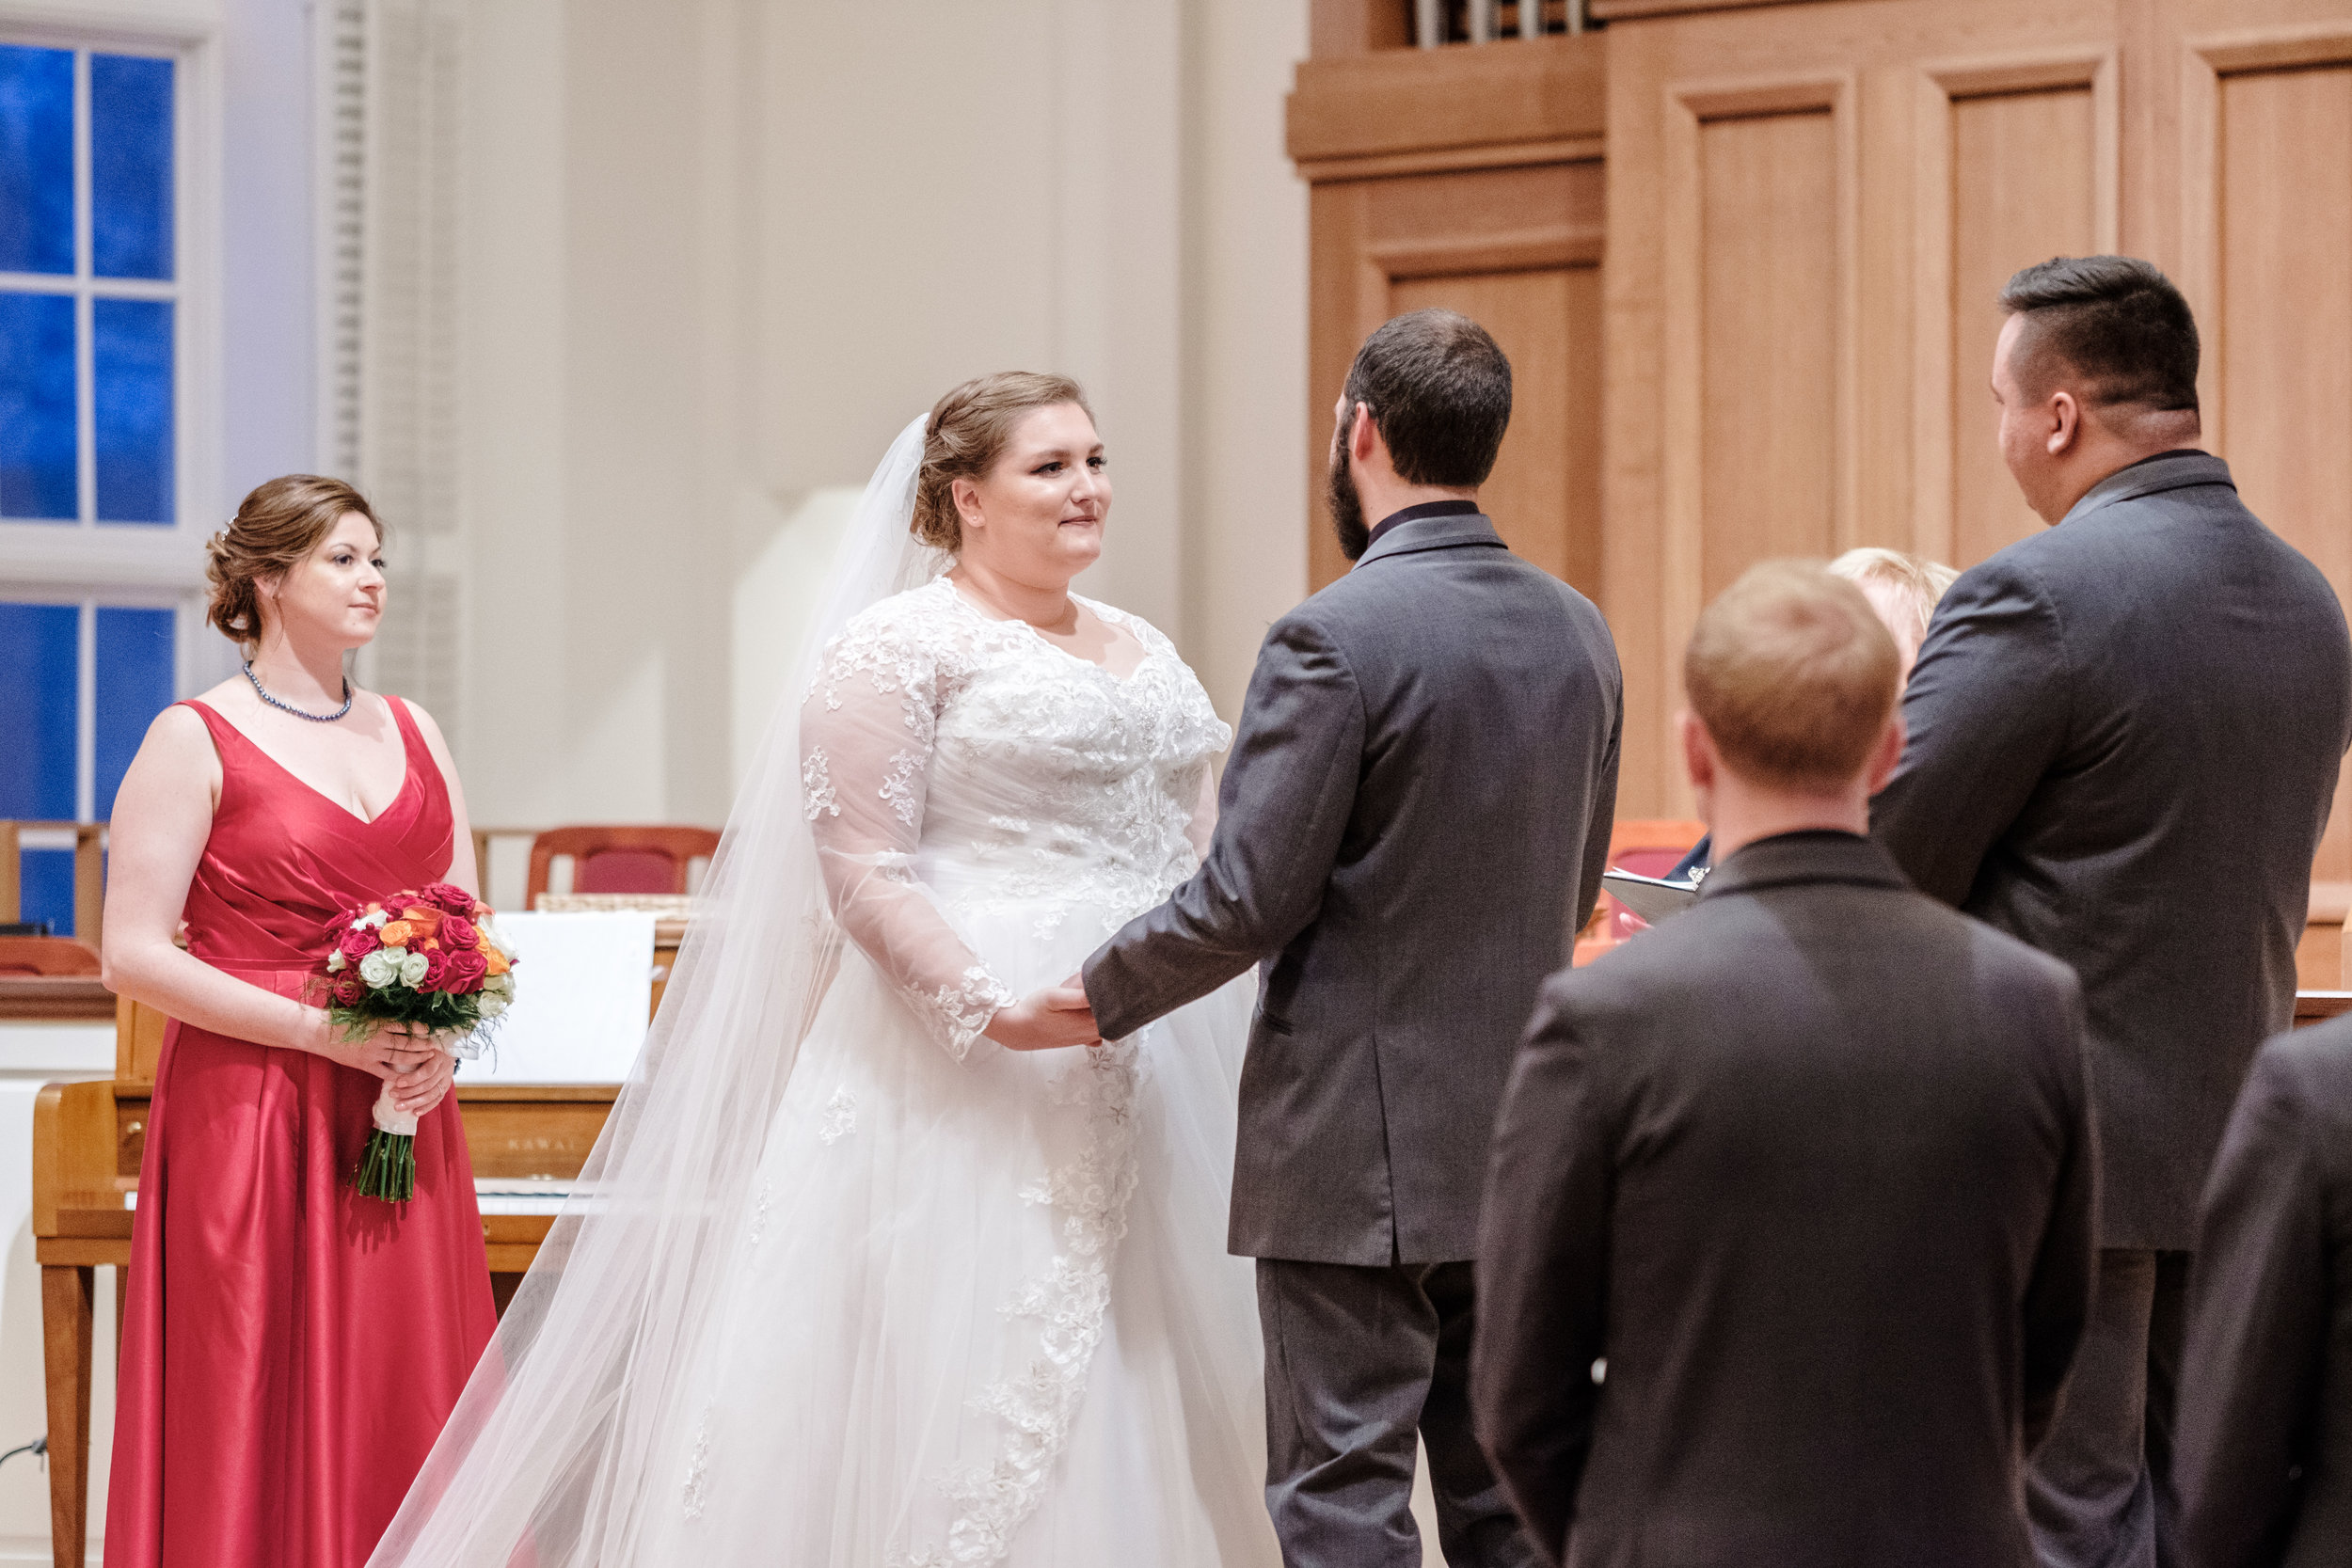 18-12-28 Corinne-Henry-Pavilion-Wedding-287.jpg